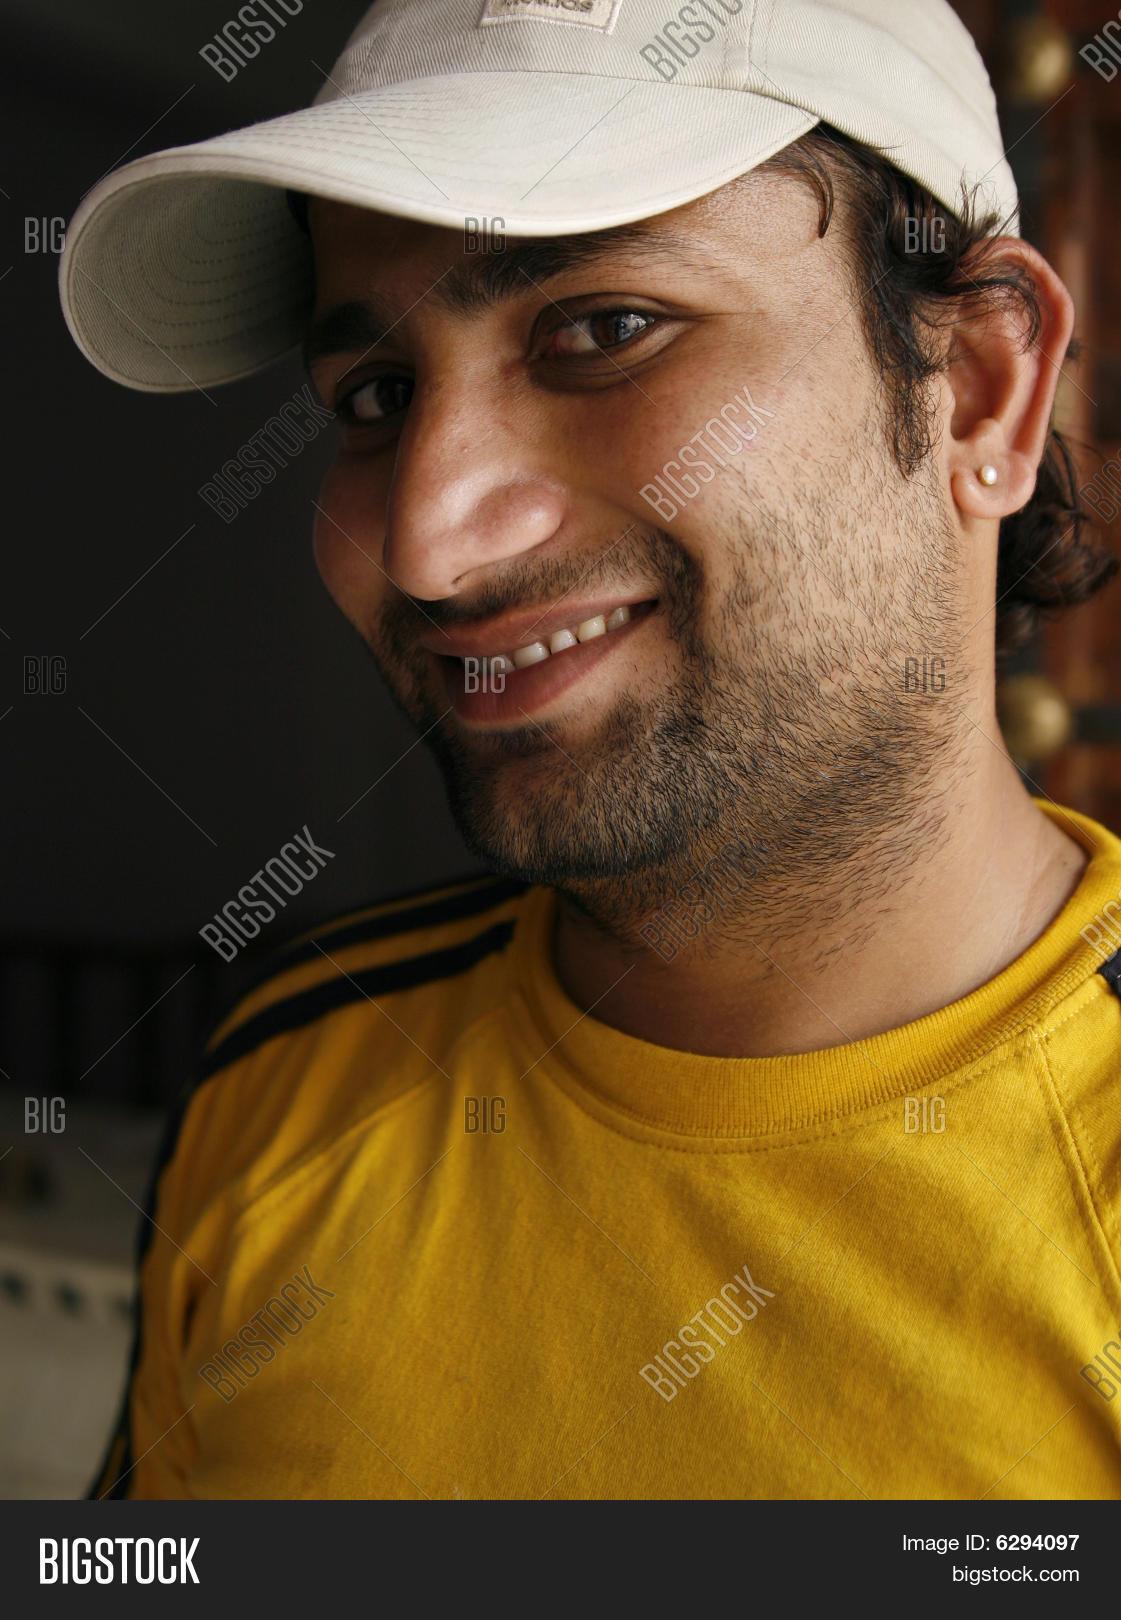 fb1de5ff6fa Smiling Indian Man Image   Photo (Free Trial)